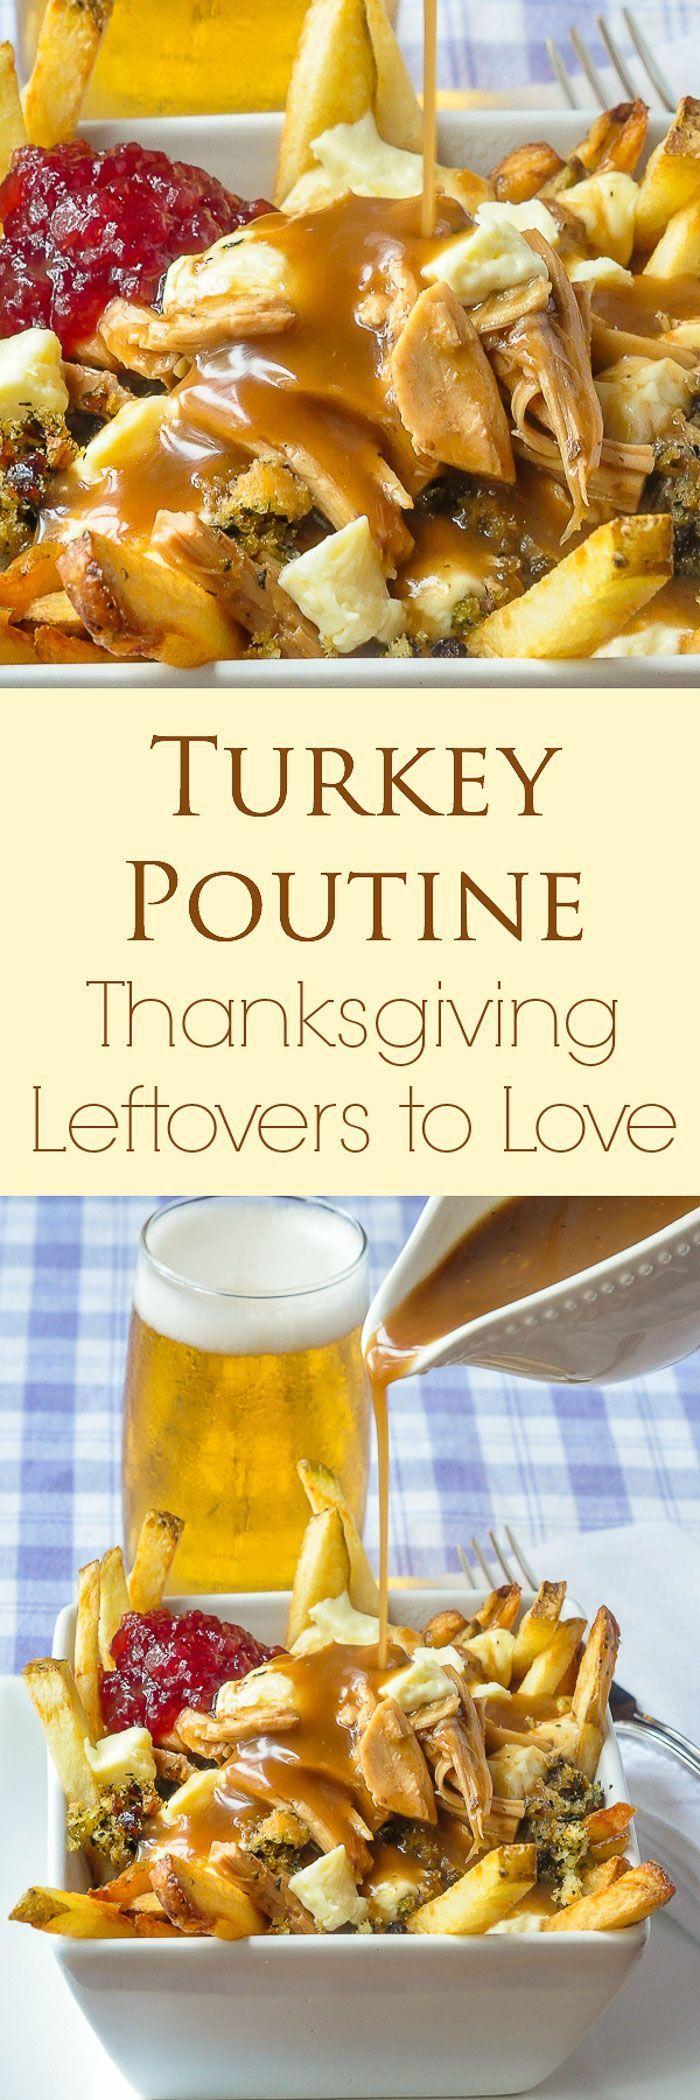 Turkey Poutine ultimate Thanksgiving leftovers Recipe